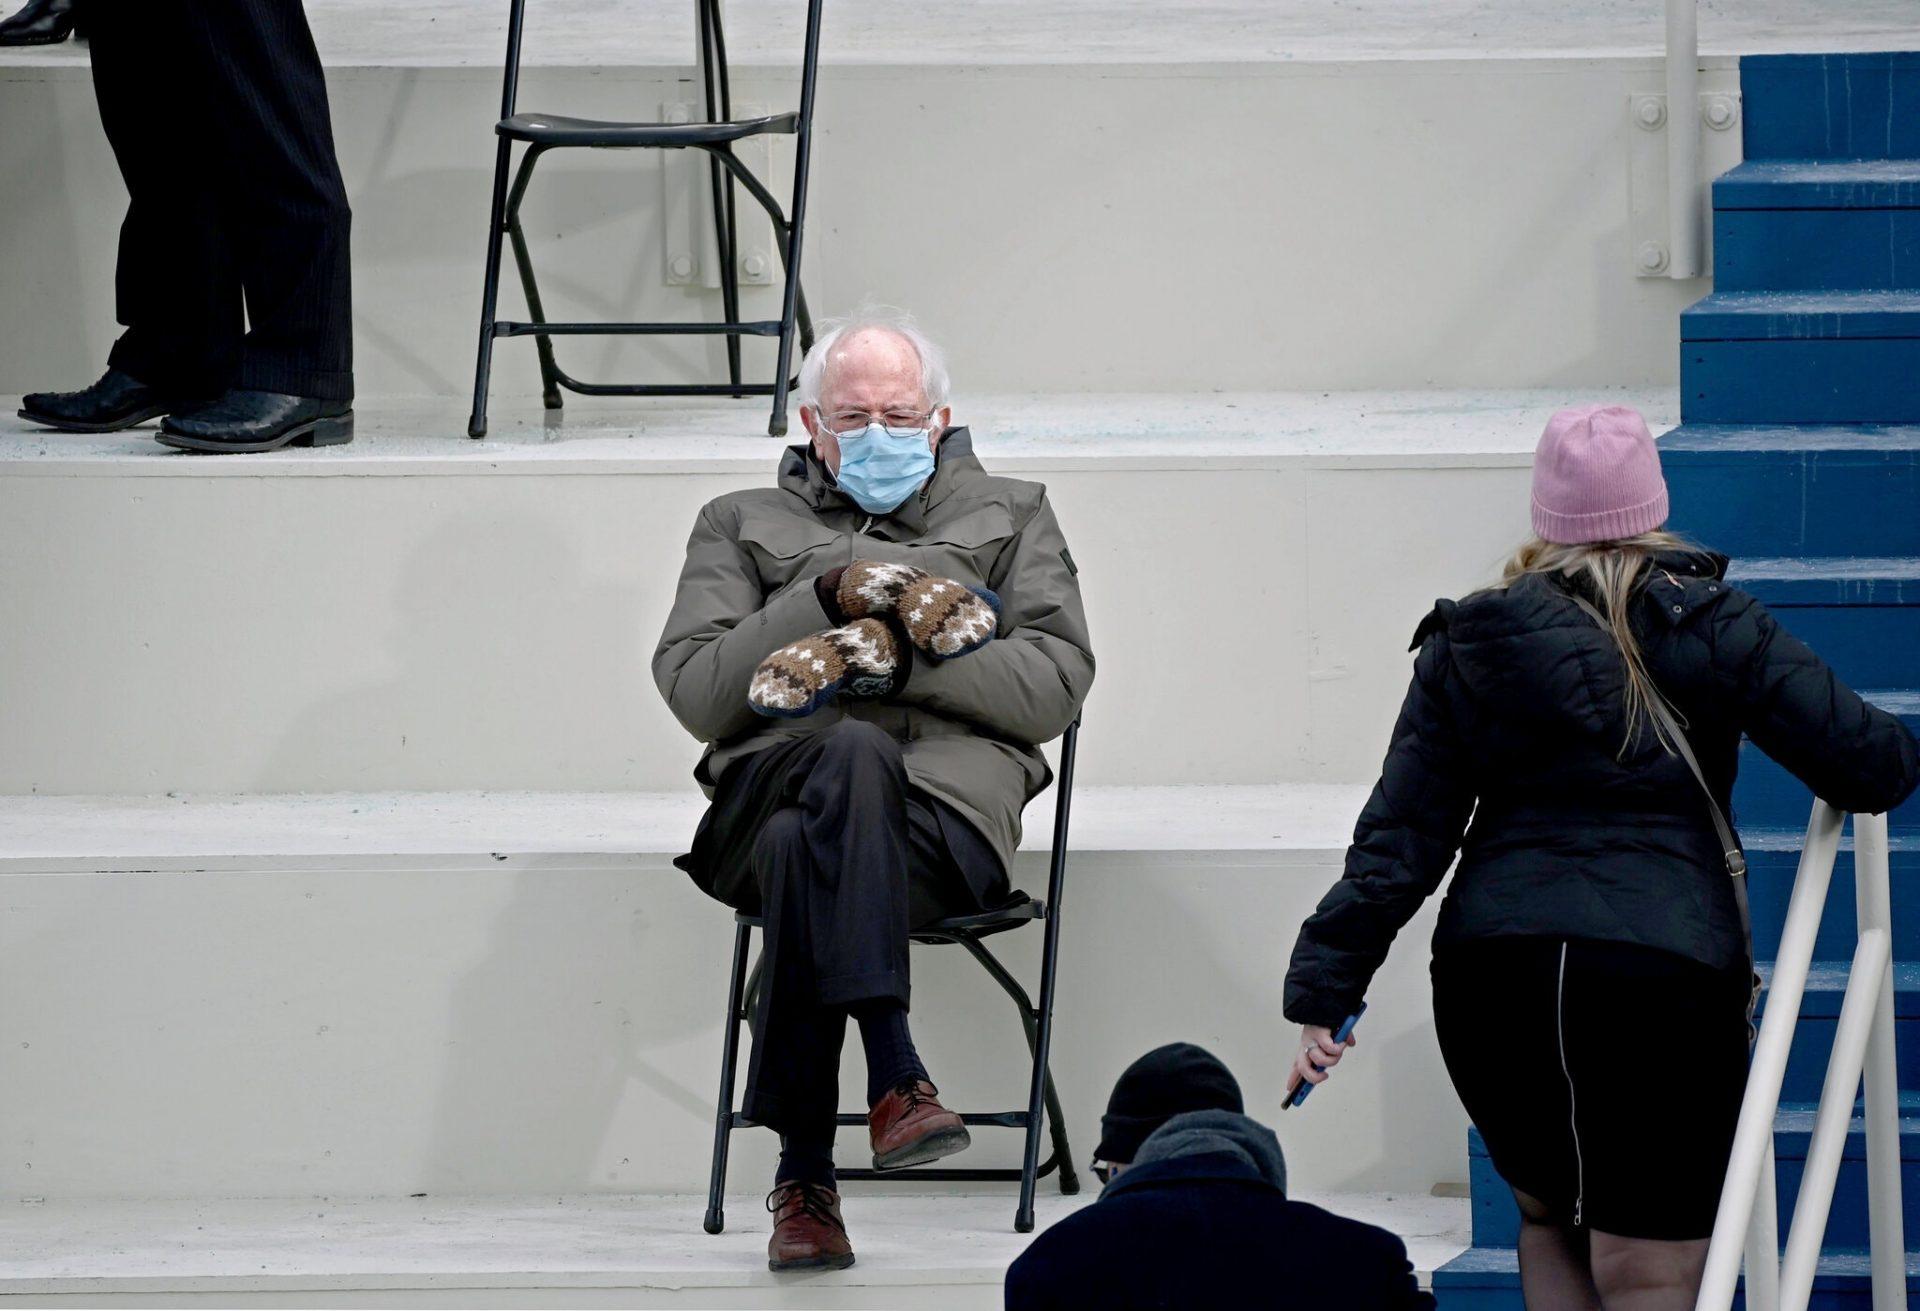 La photo originale de Bernie Sanders en mouffle